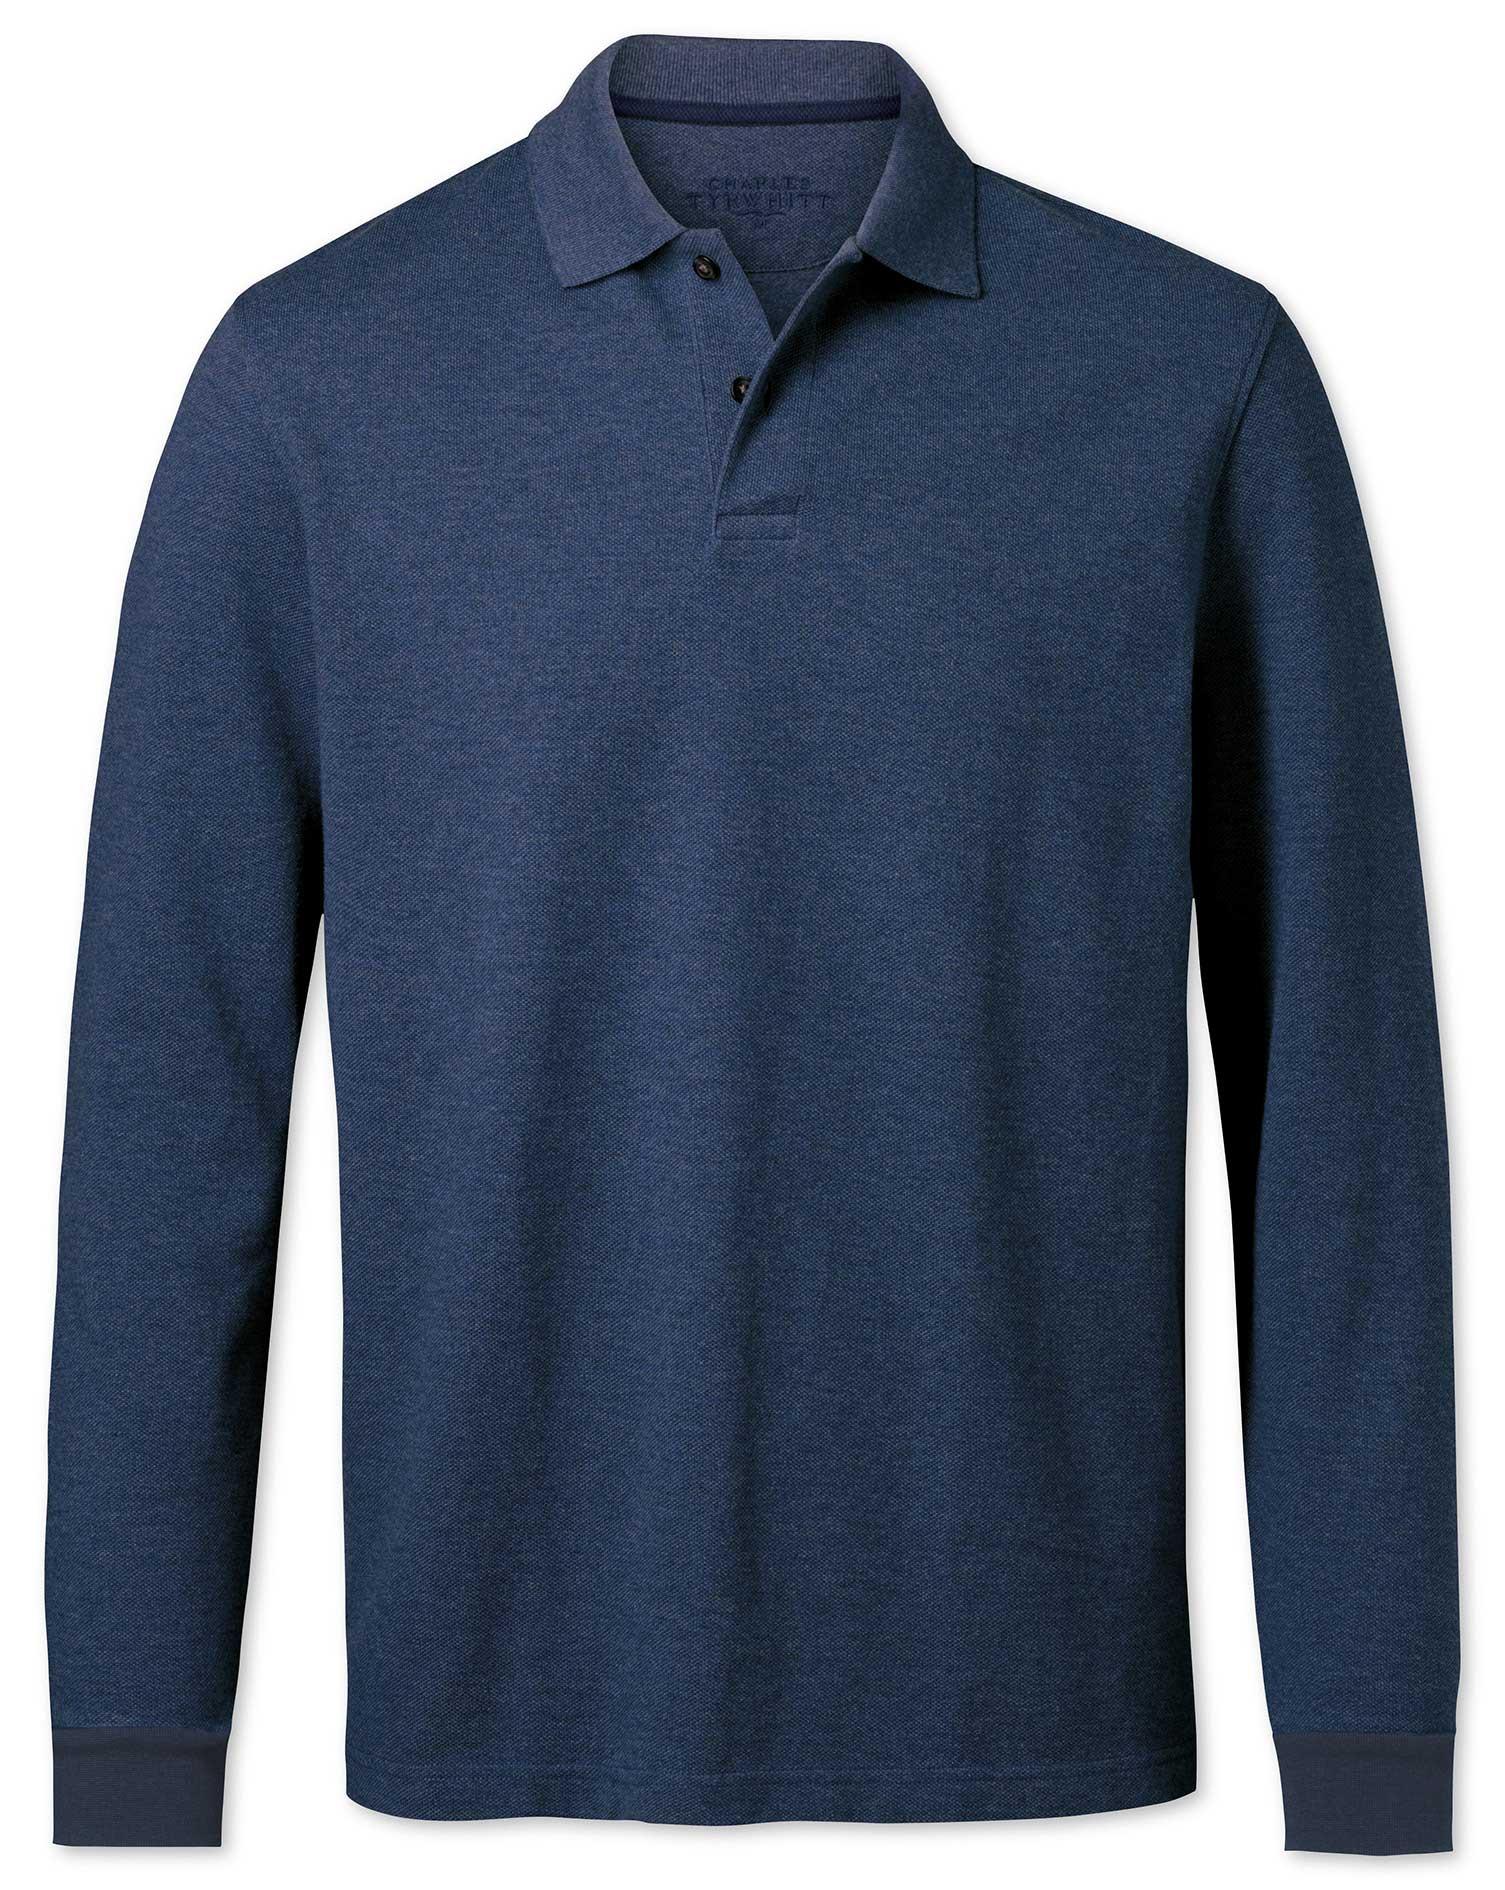 Indigo Melange Pique Long Sleeve Cotton Polo Size XXXL by Charles Tyrwhitt